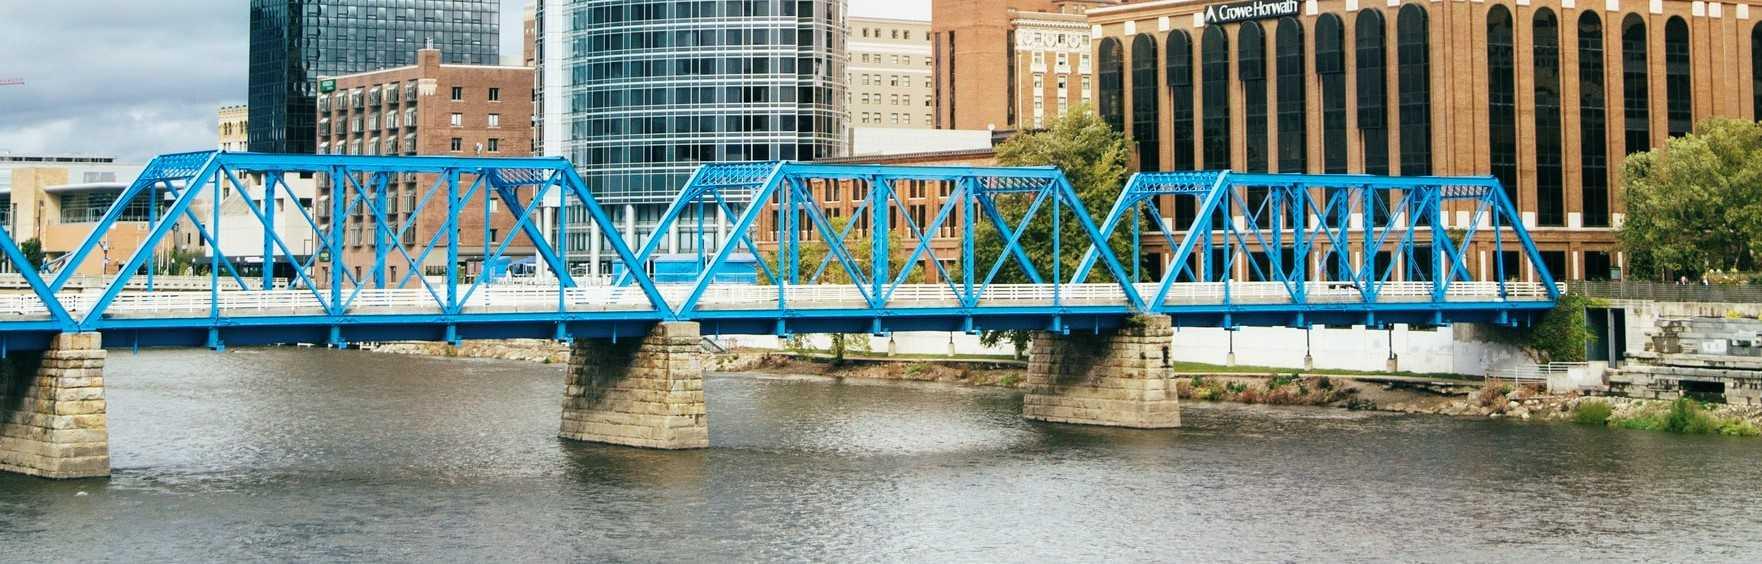 Bridge in Grand Rapids, Michigan | Breast Cancer Car Donations